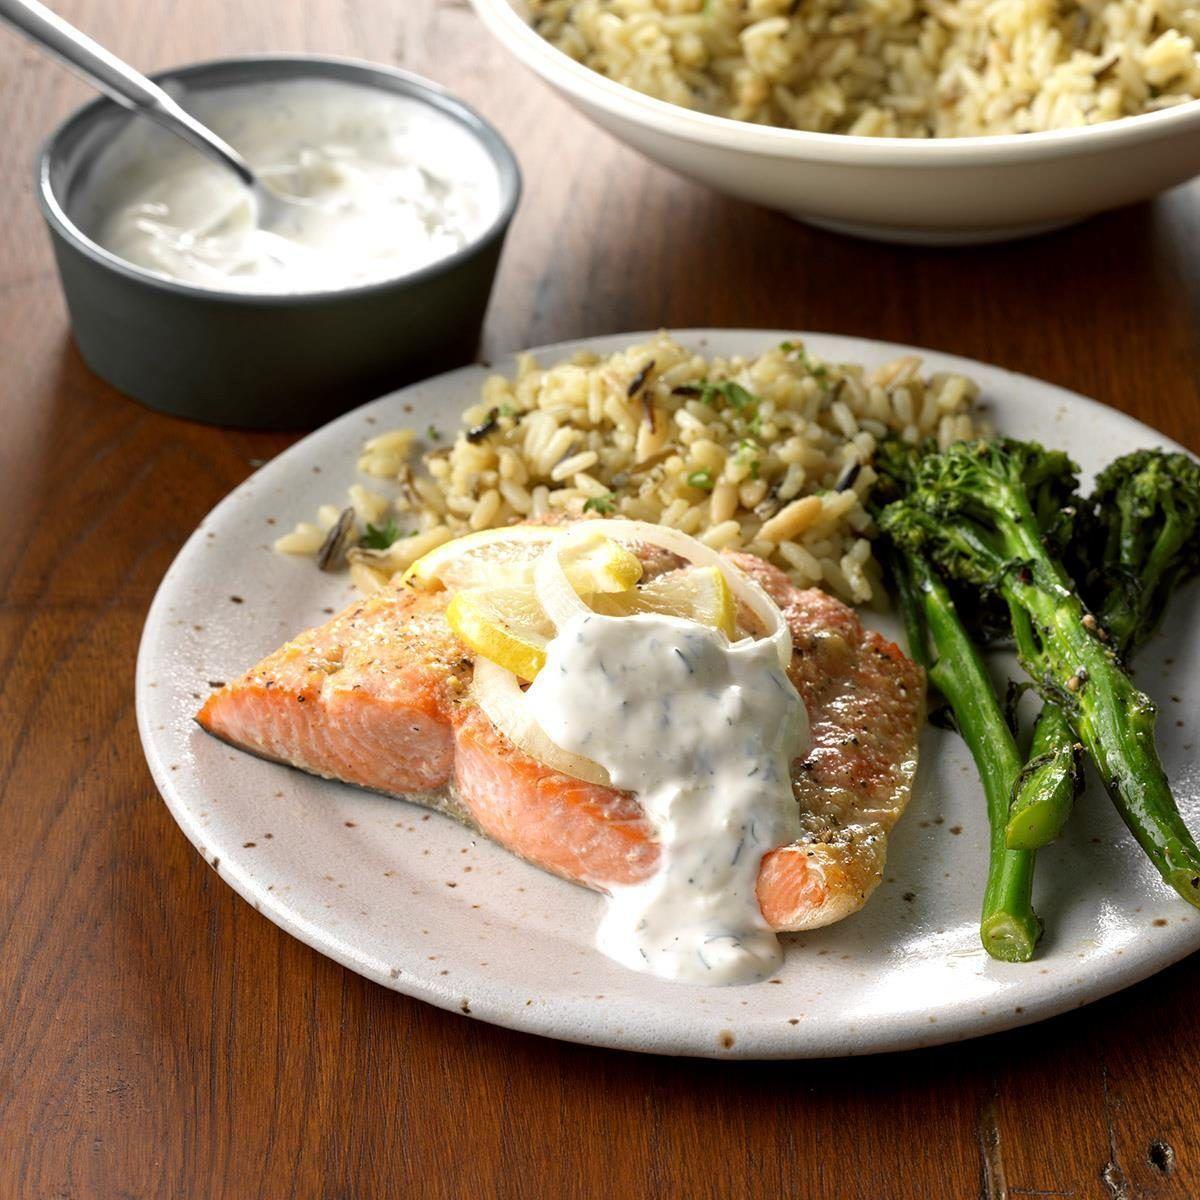 Salmon With Creamy Dill Sauce Recipe In 2020 Creamy Dill Sauce Dill Sauce Salmon Recipes